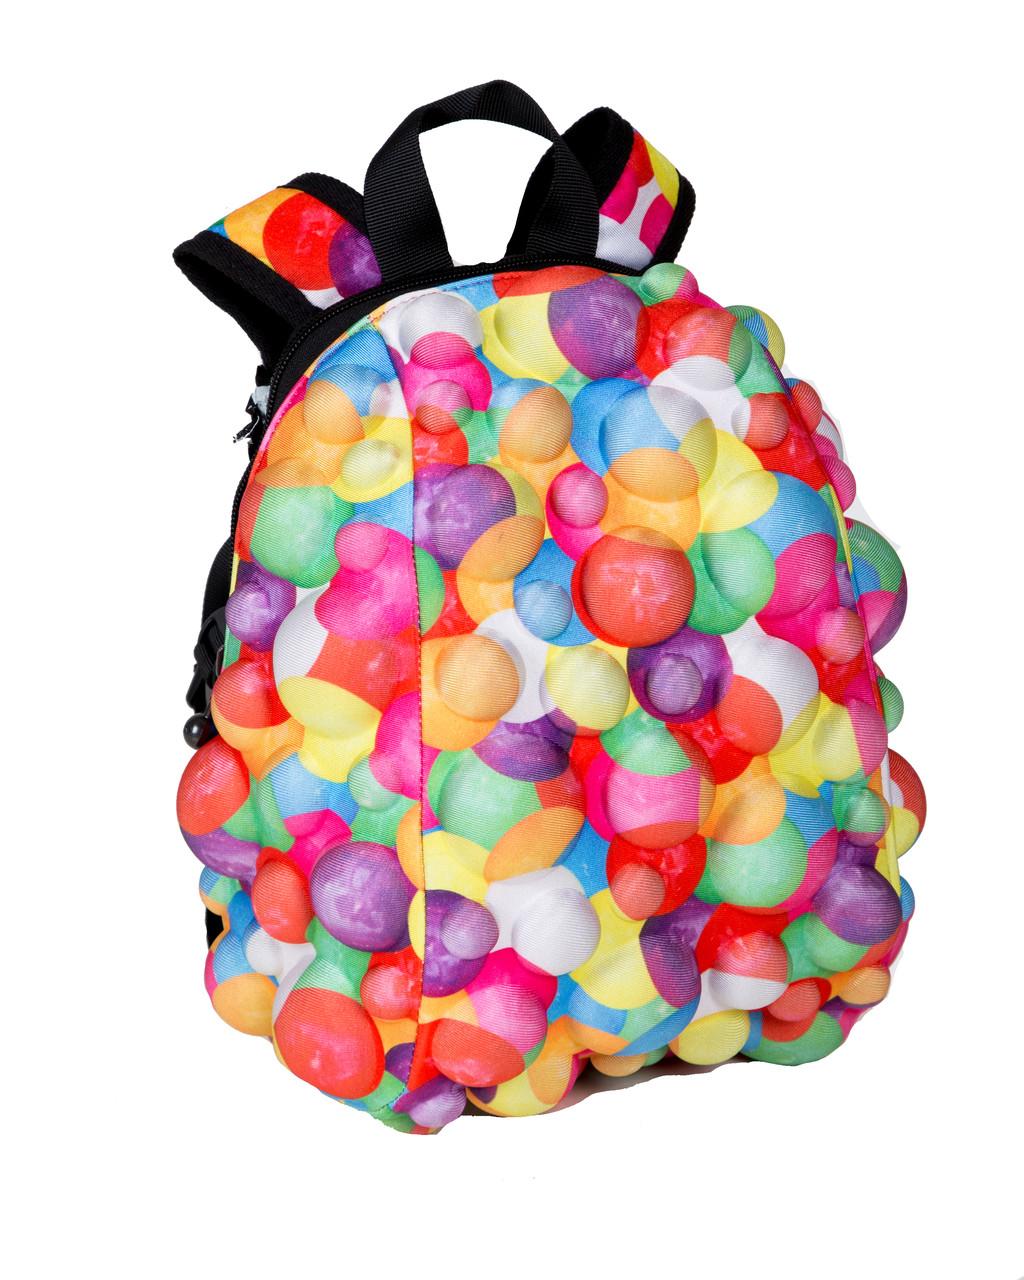 Рюкзак Madpax Bubble Pint Dont Burst my Bubble (M/PINT/DON)